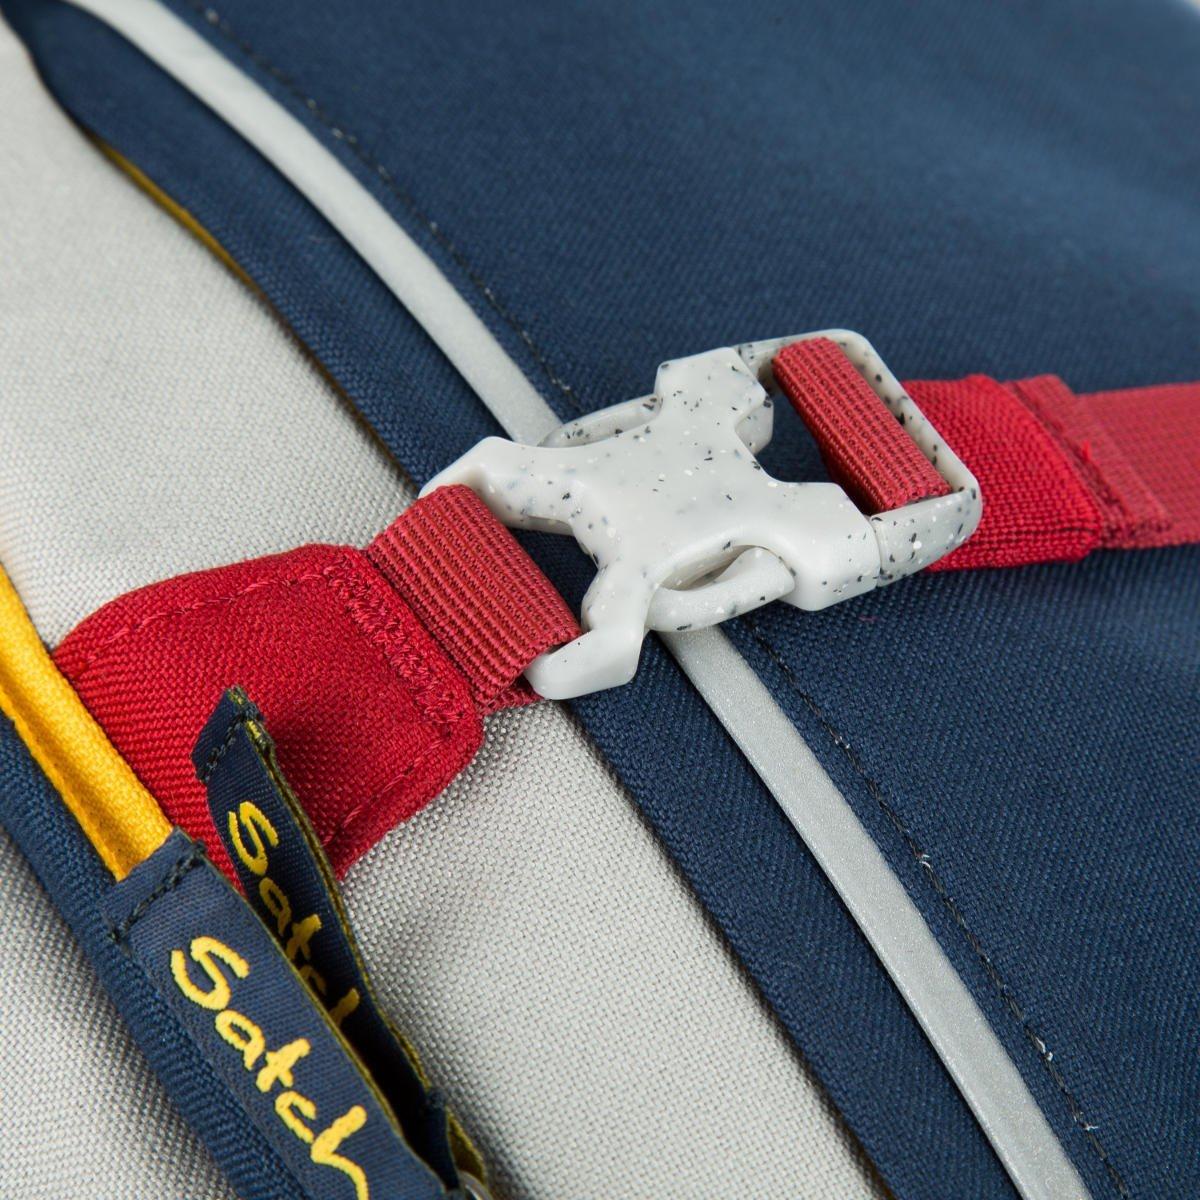 Satch Pack рюкзак для школьника цвет Flash Hopper, - фото 7